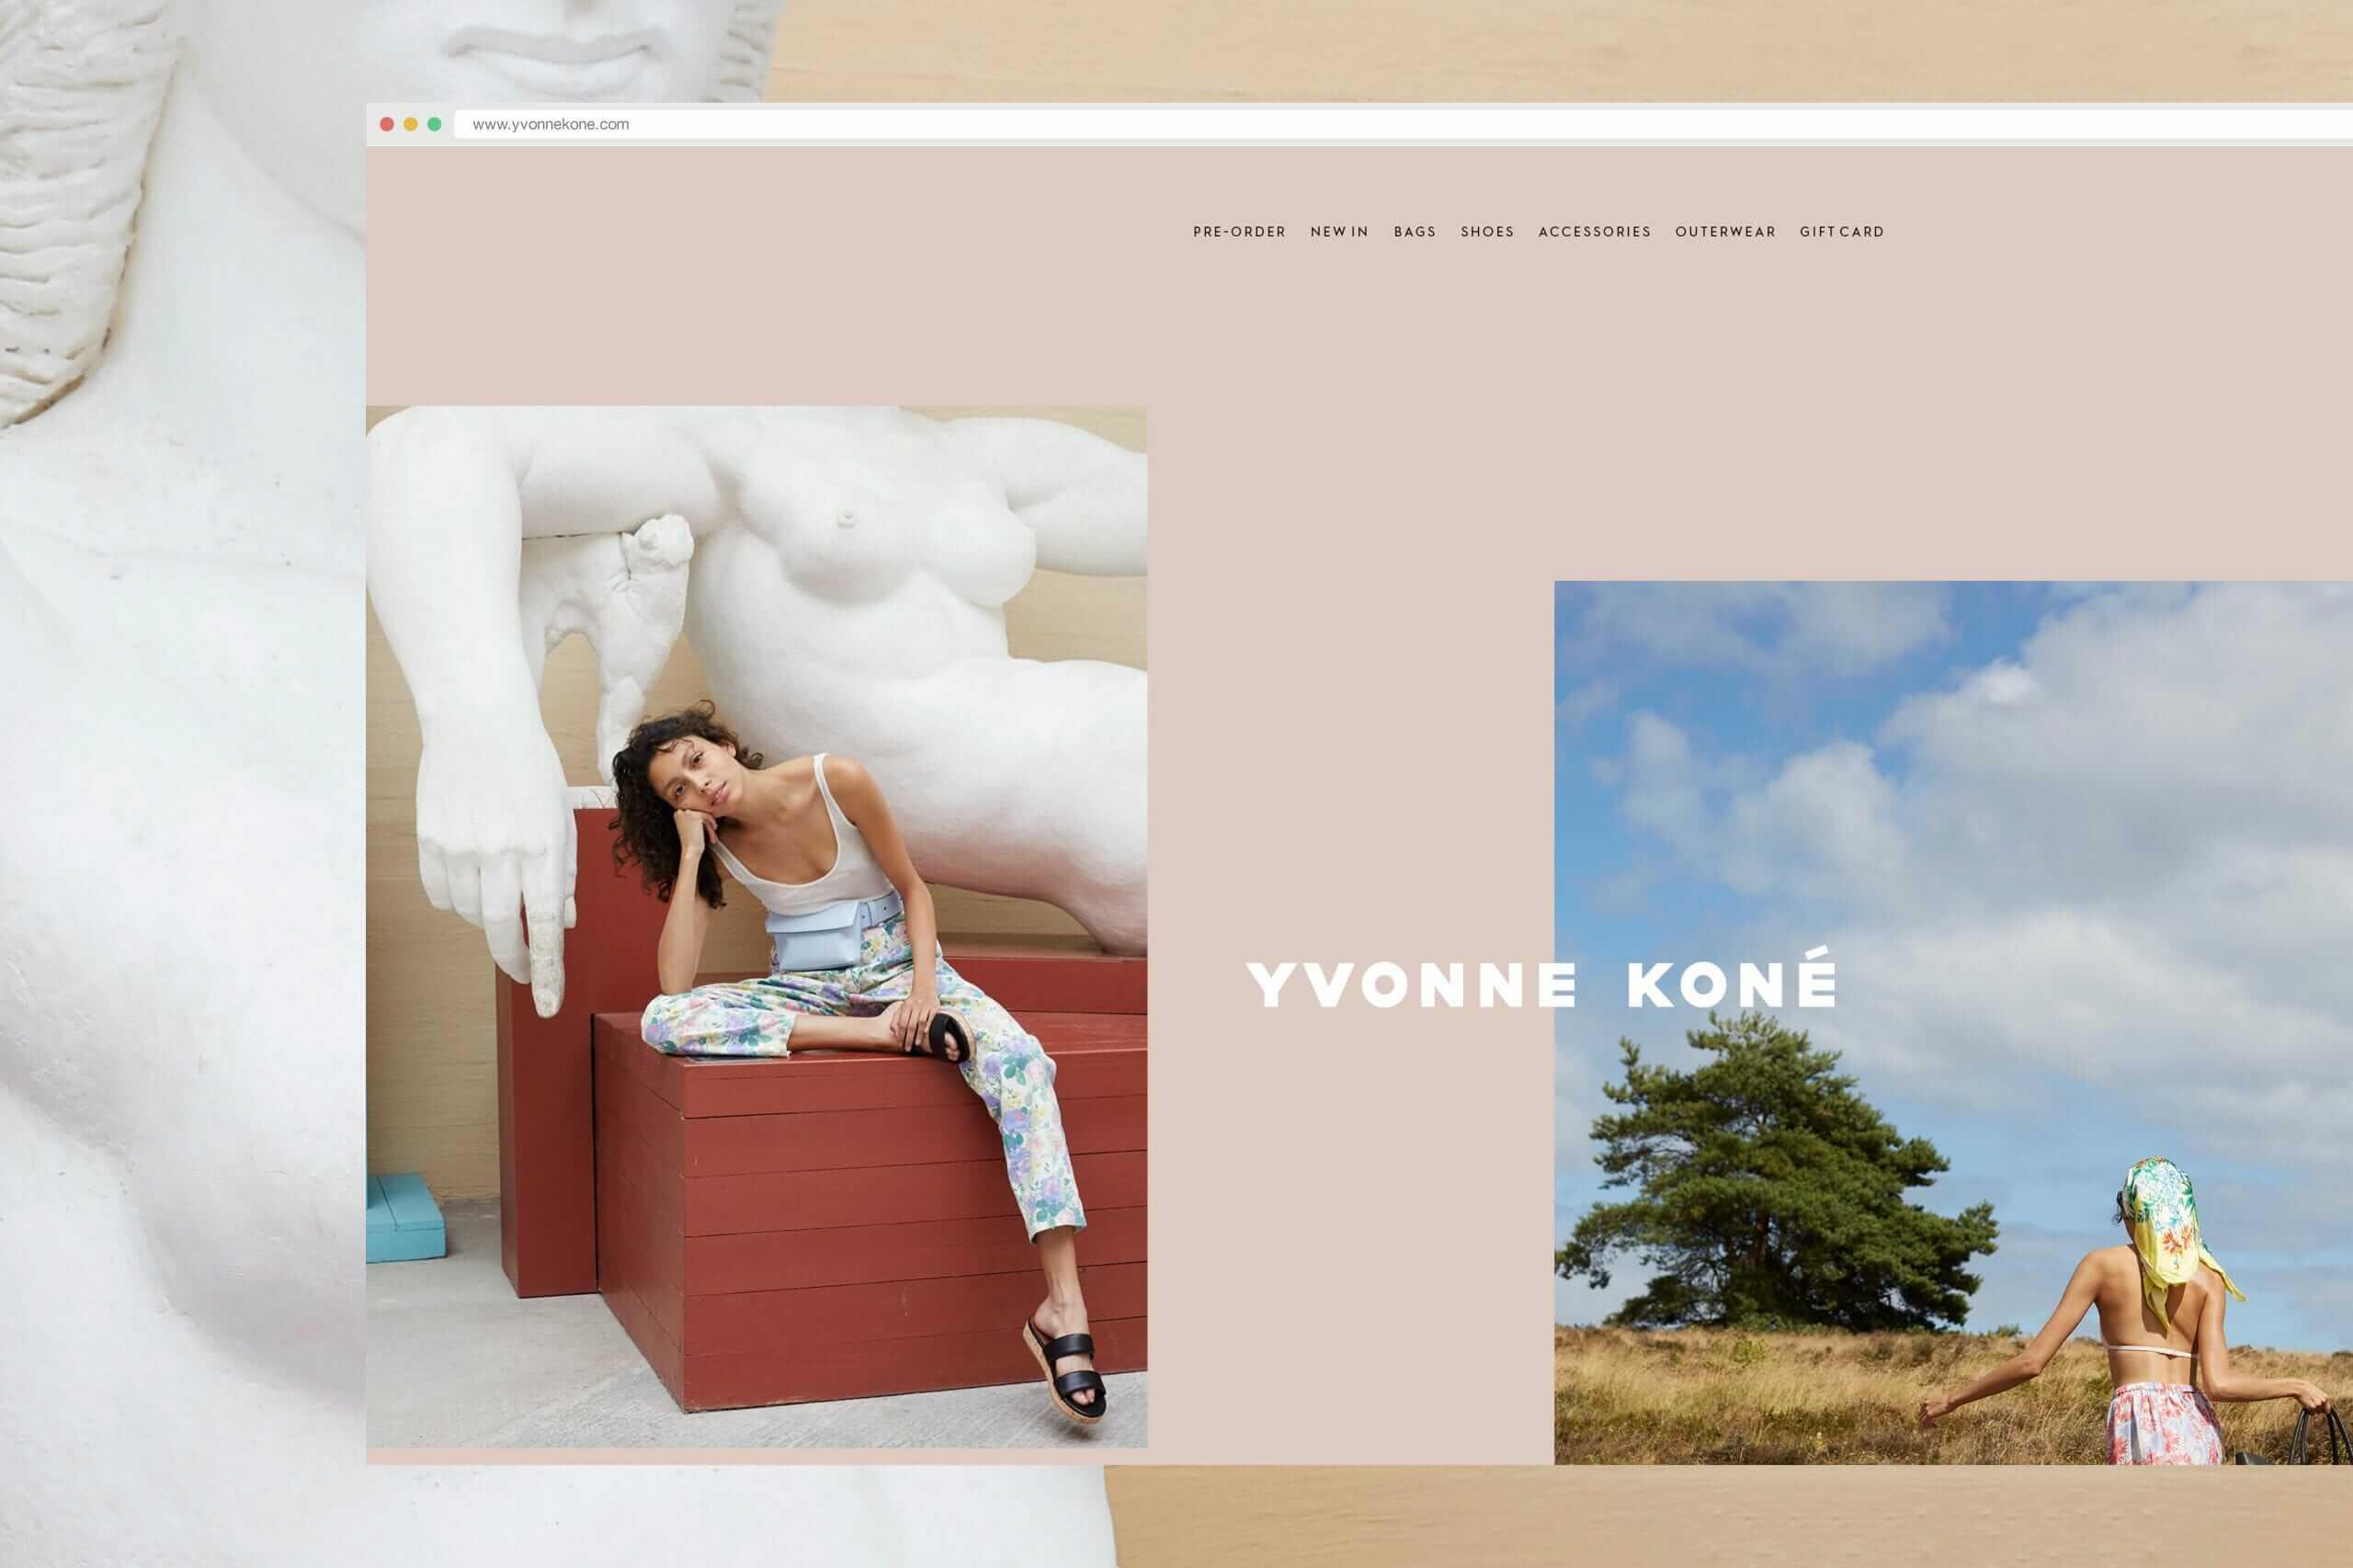 AI_YvonneKone_LR_20-compressor